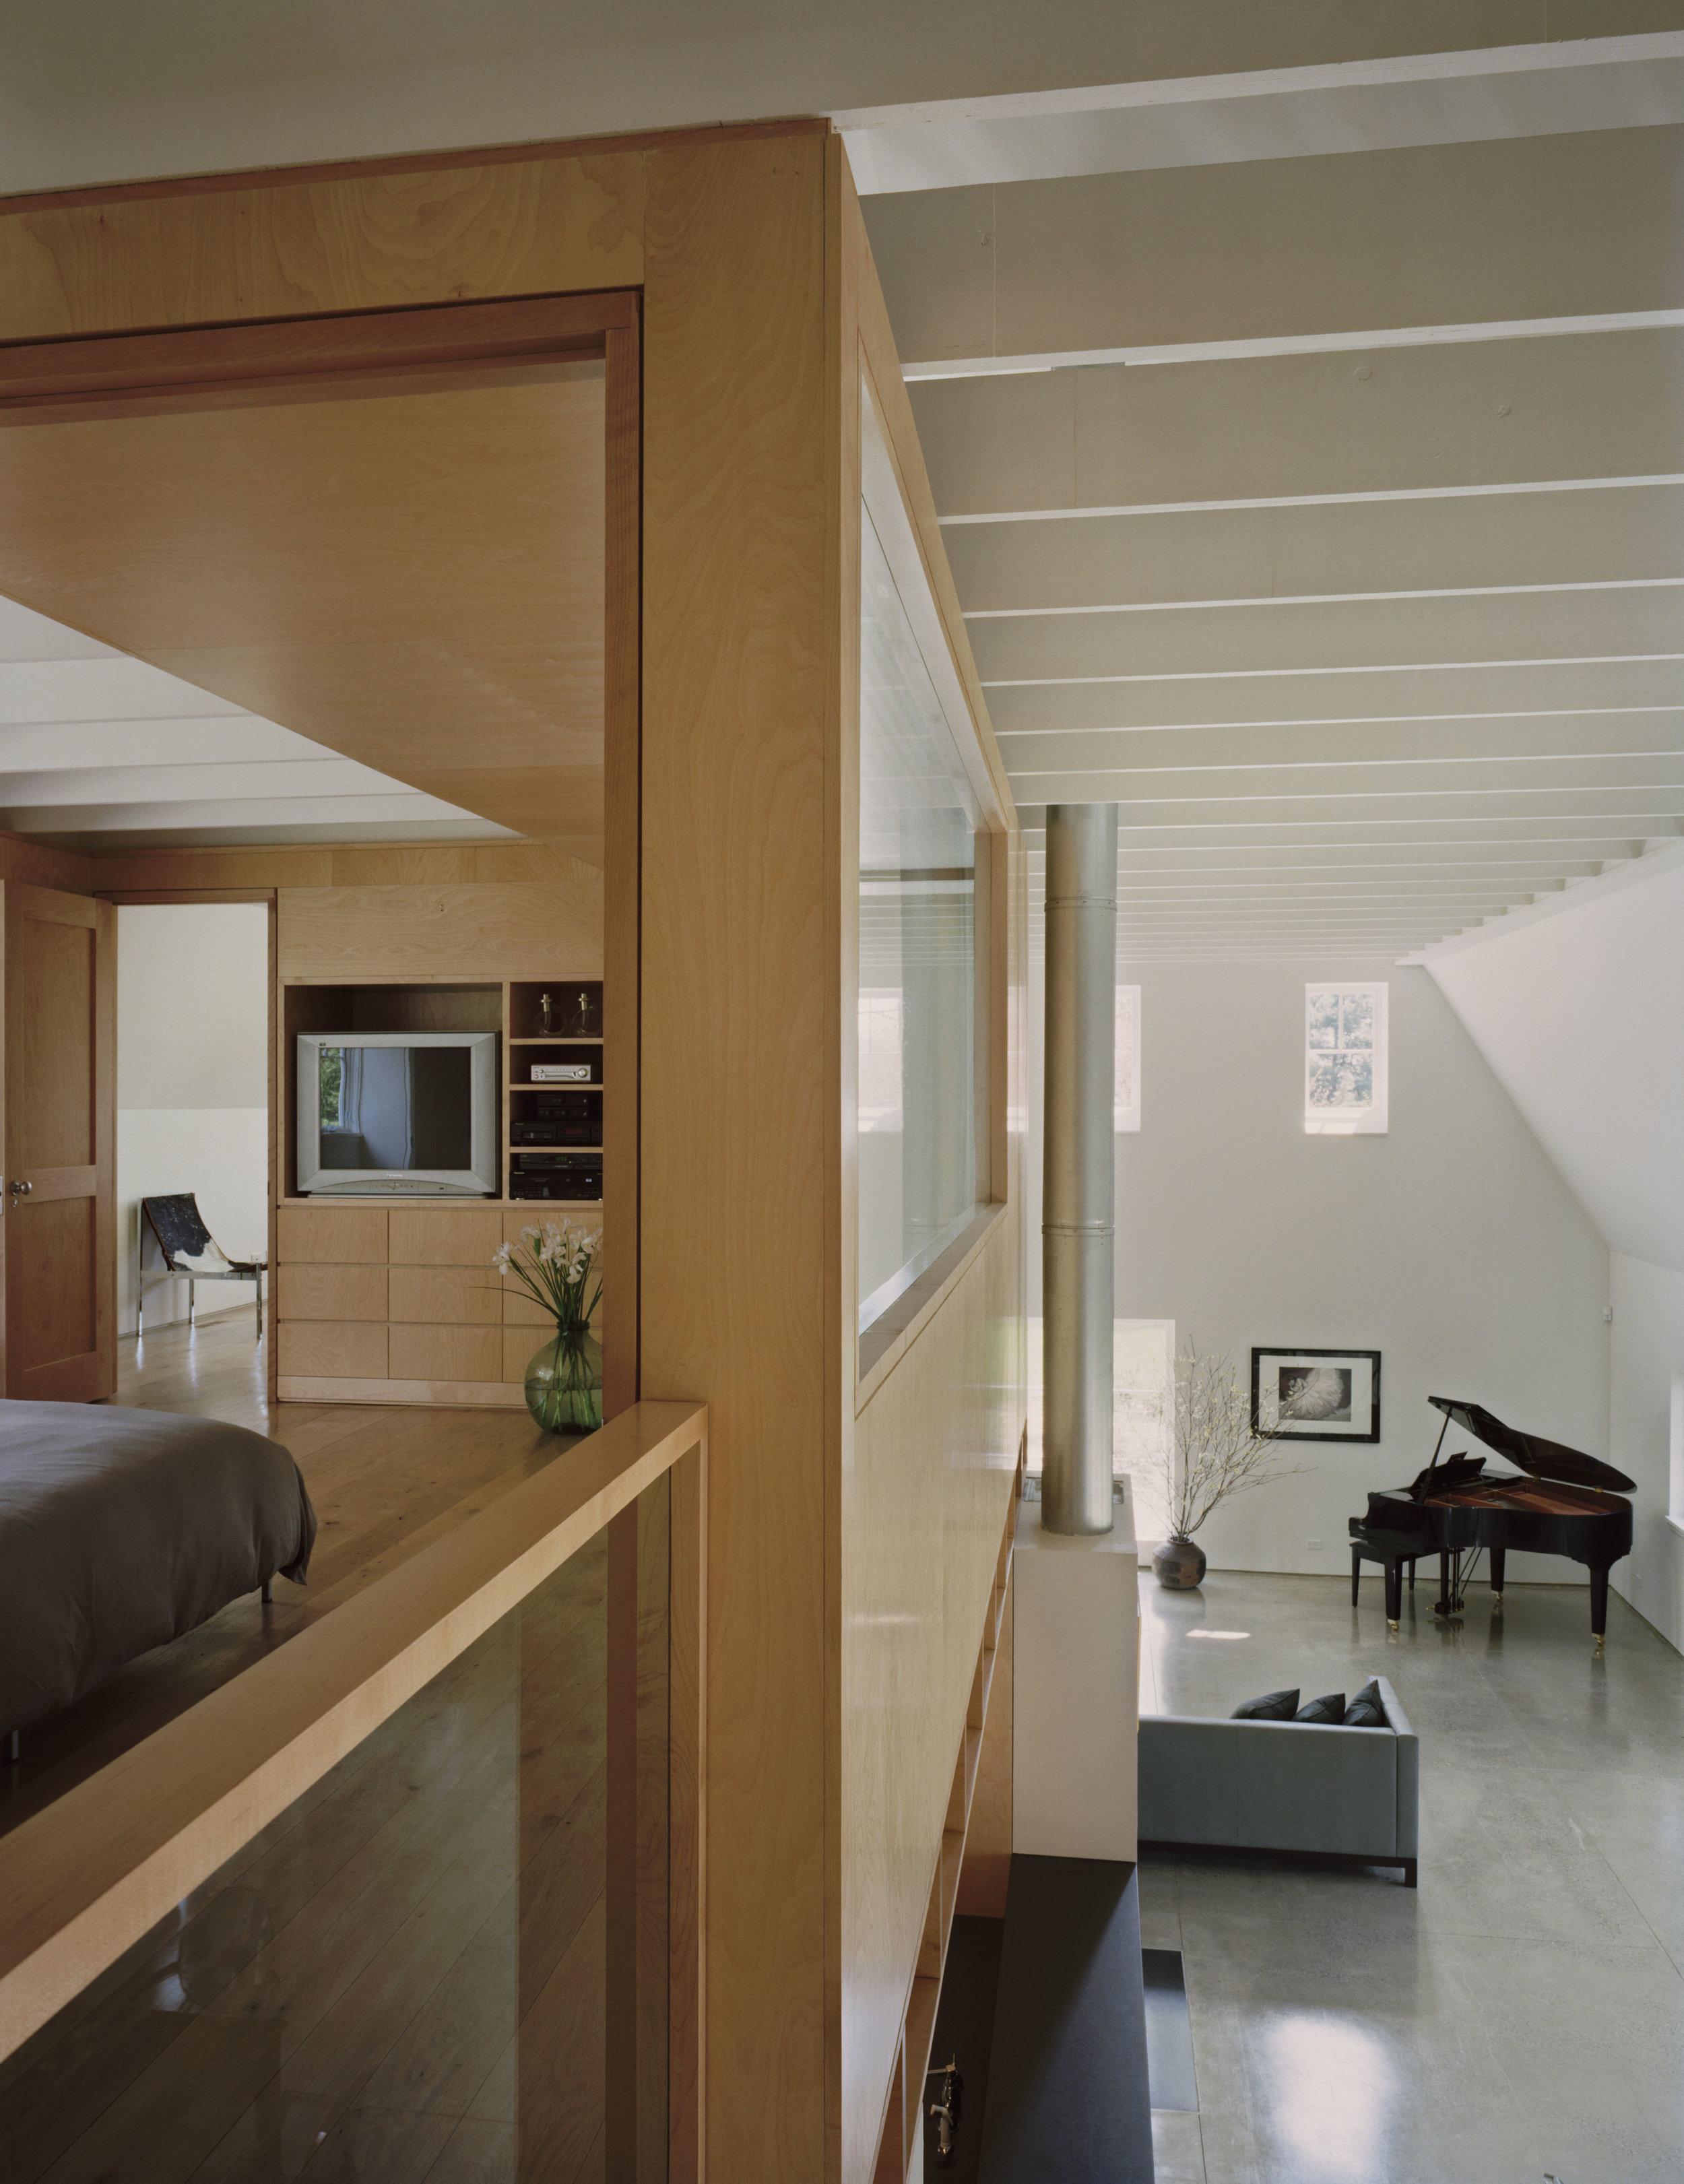 luxury kitchen appliances comfortable